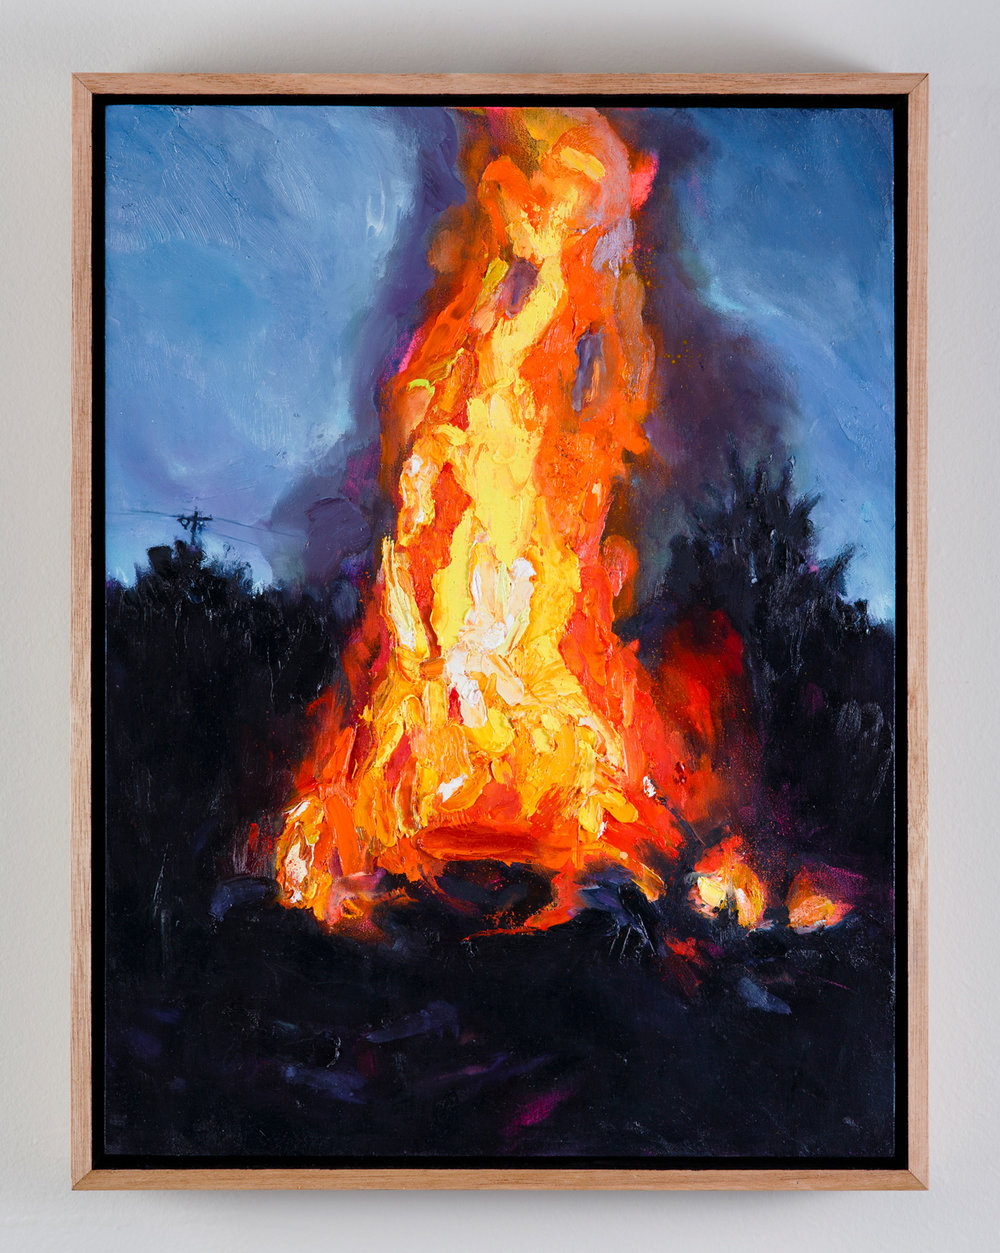 Beacon  2018 Oil on Wood  Daniel Grant